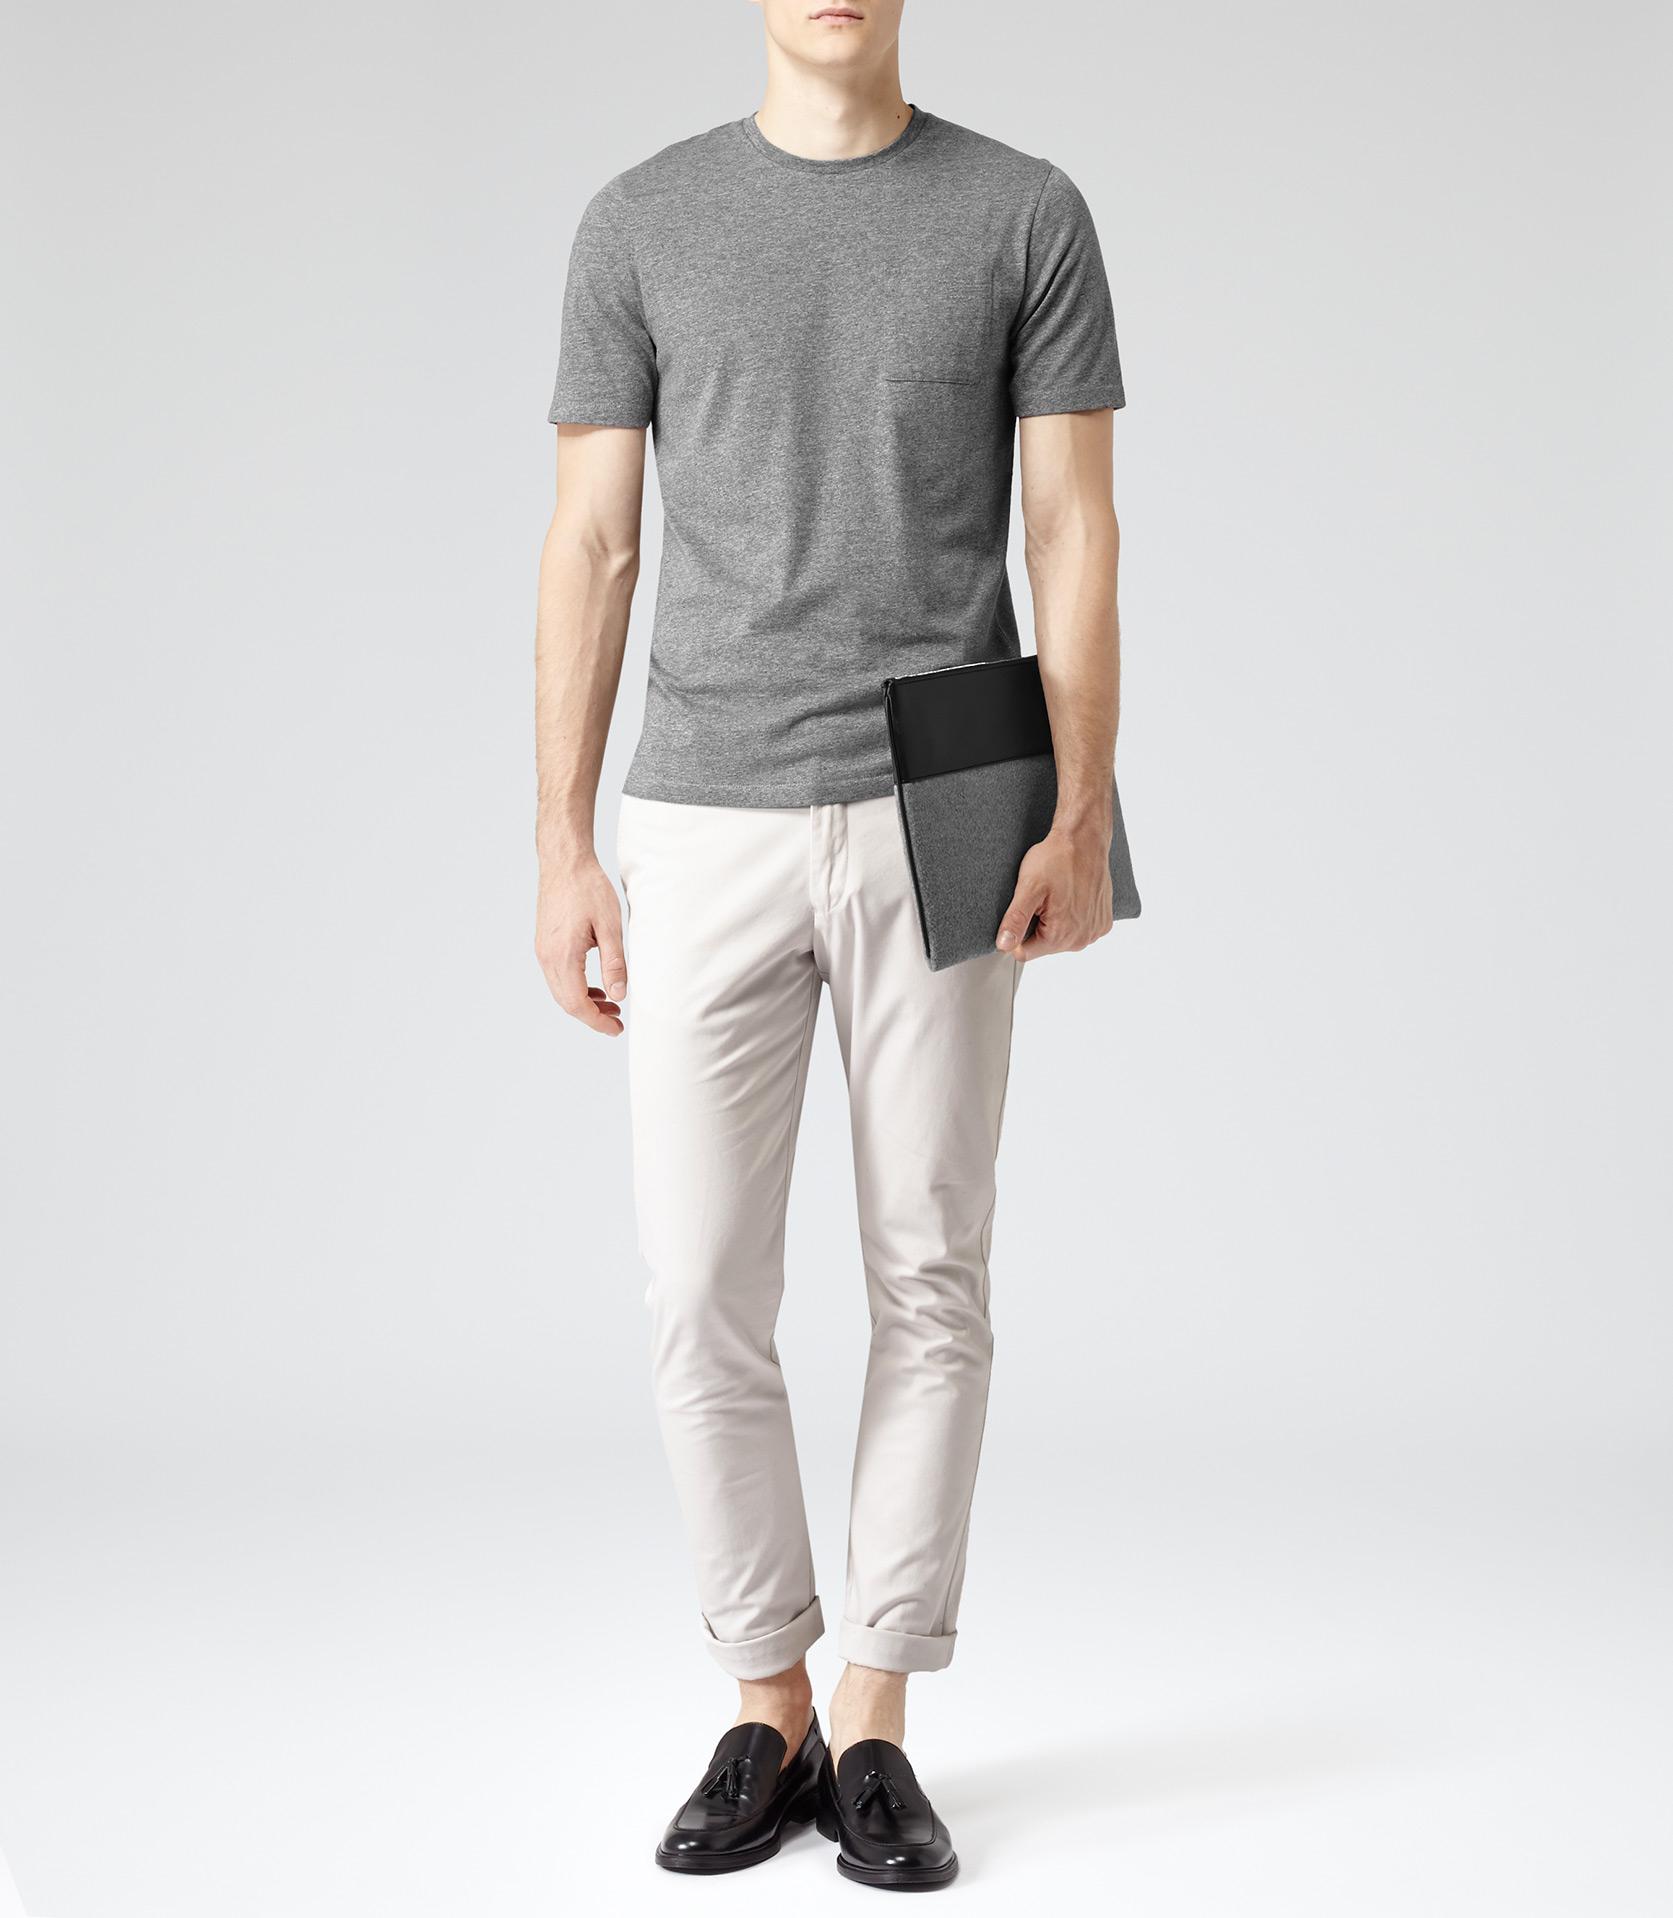 Lyst reiss azera horizontal stripe t shirt in gray for men for Horizontal striped dress shirts men